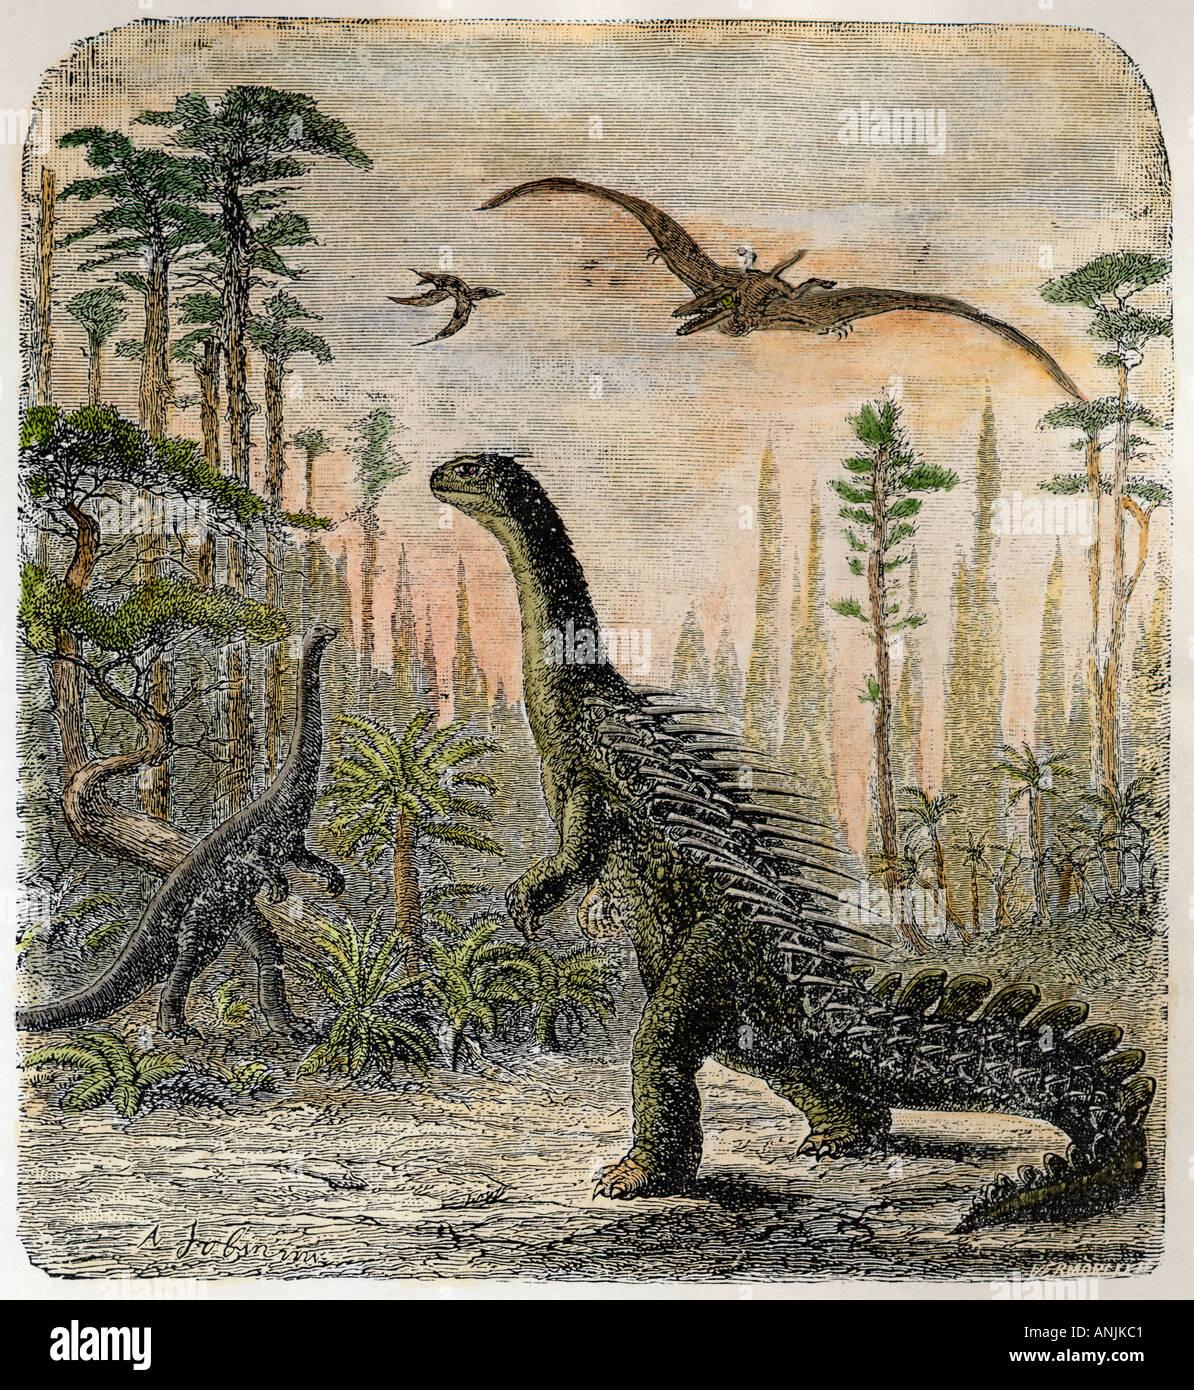 Dinosaur Stegosaurus - Stock Image